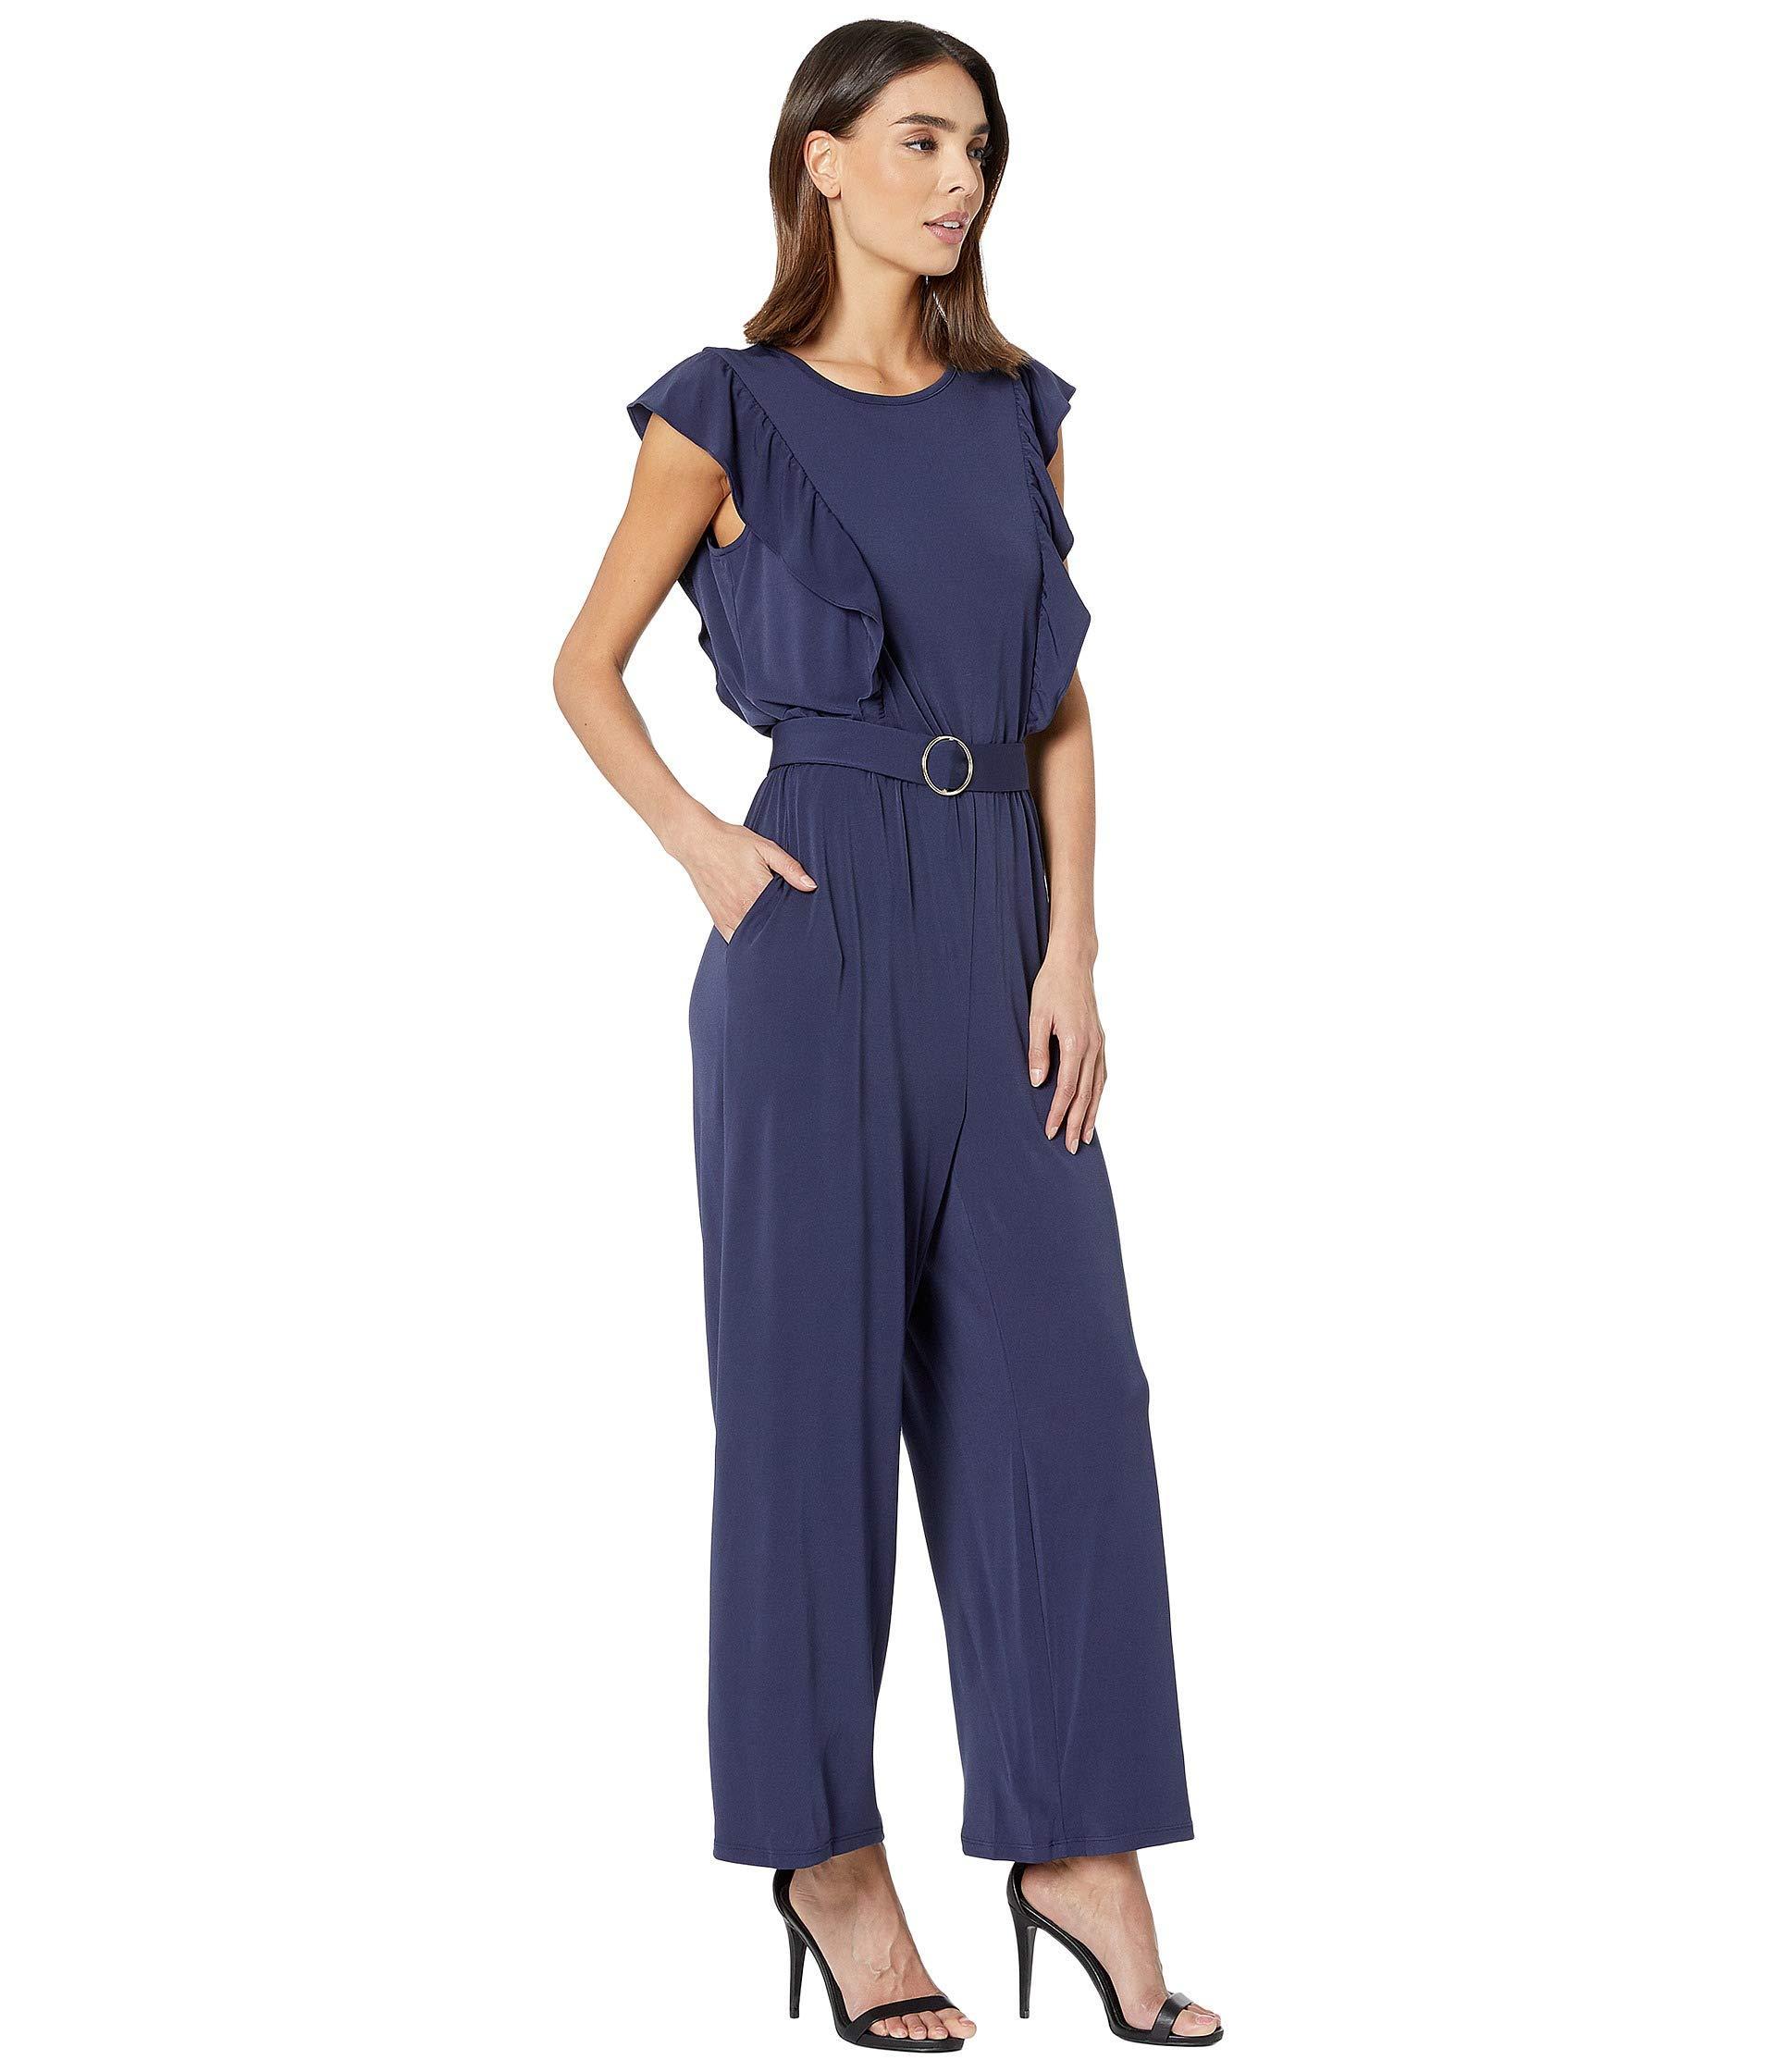 0e2f812dab7 ... Solid Ring Belt Jumpsuit (true Navy) Women s Jumpsuit  . View fullscreen